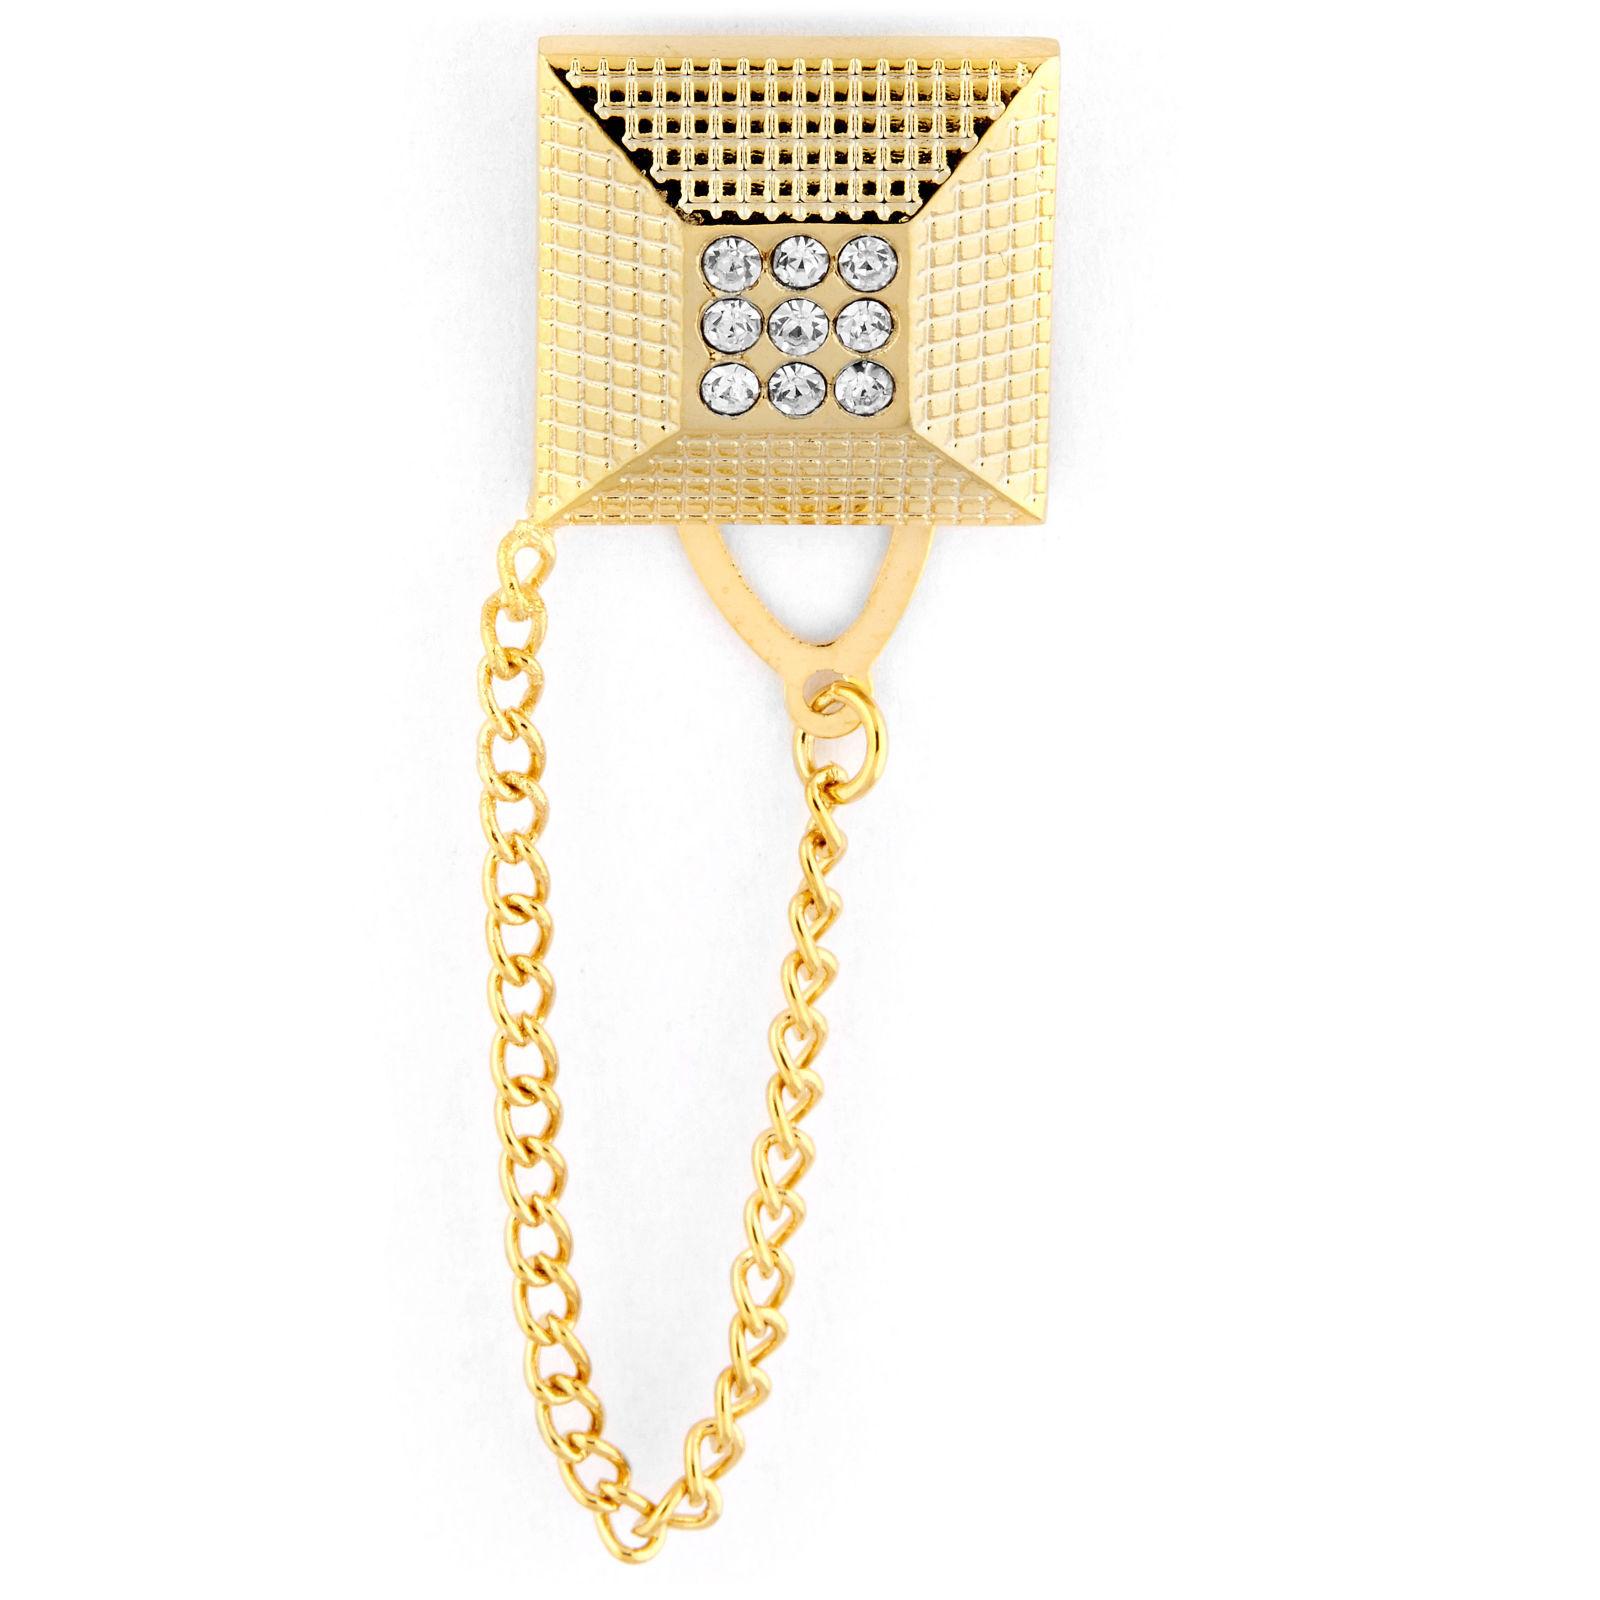 Warren Asher Kulta ja timantti -rintaneula